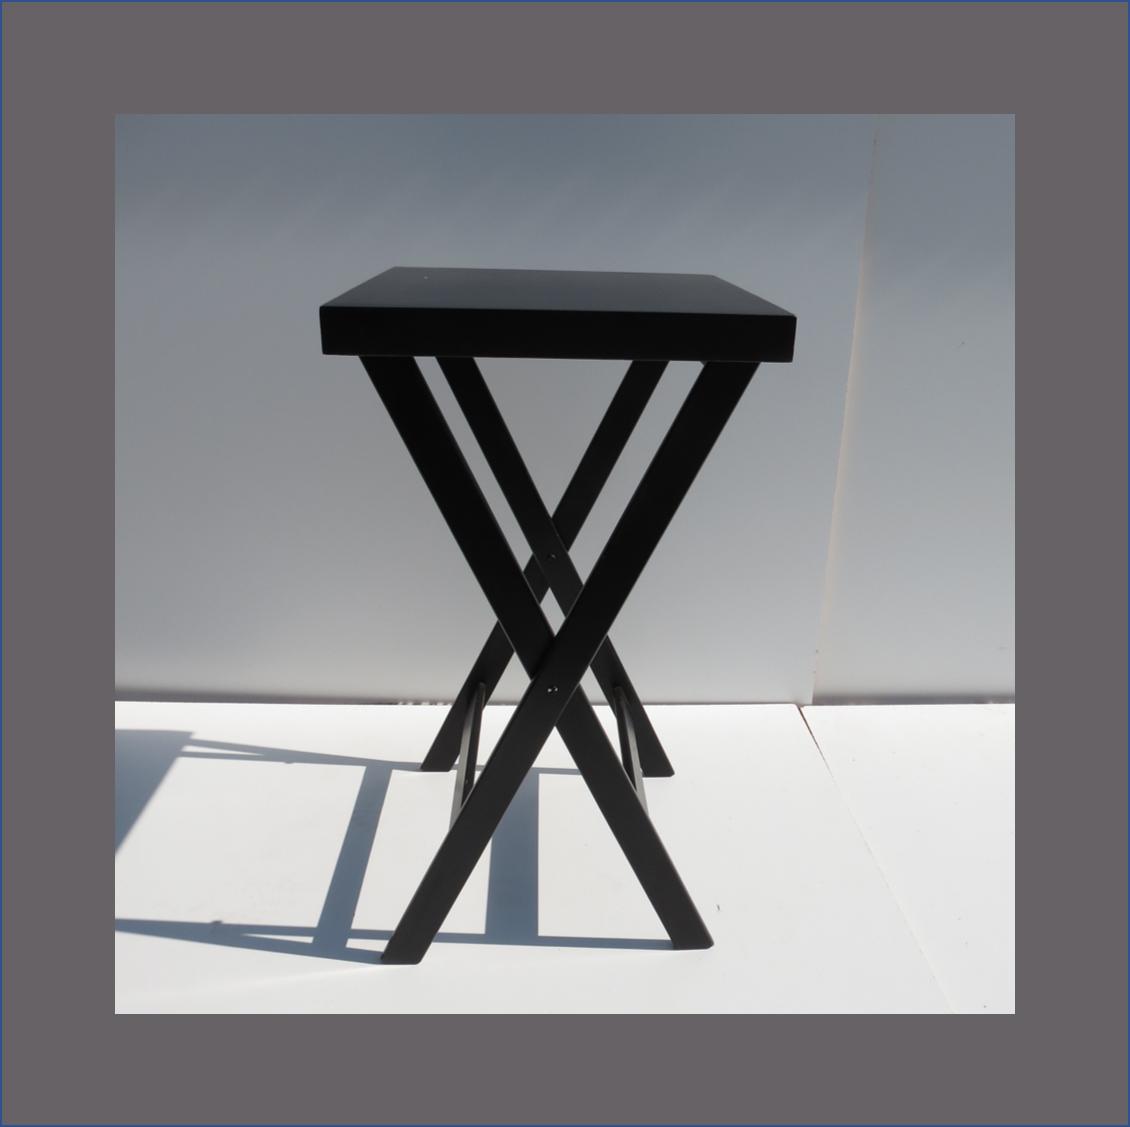 criss-cross-mahogany-cocktail-table